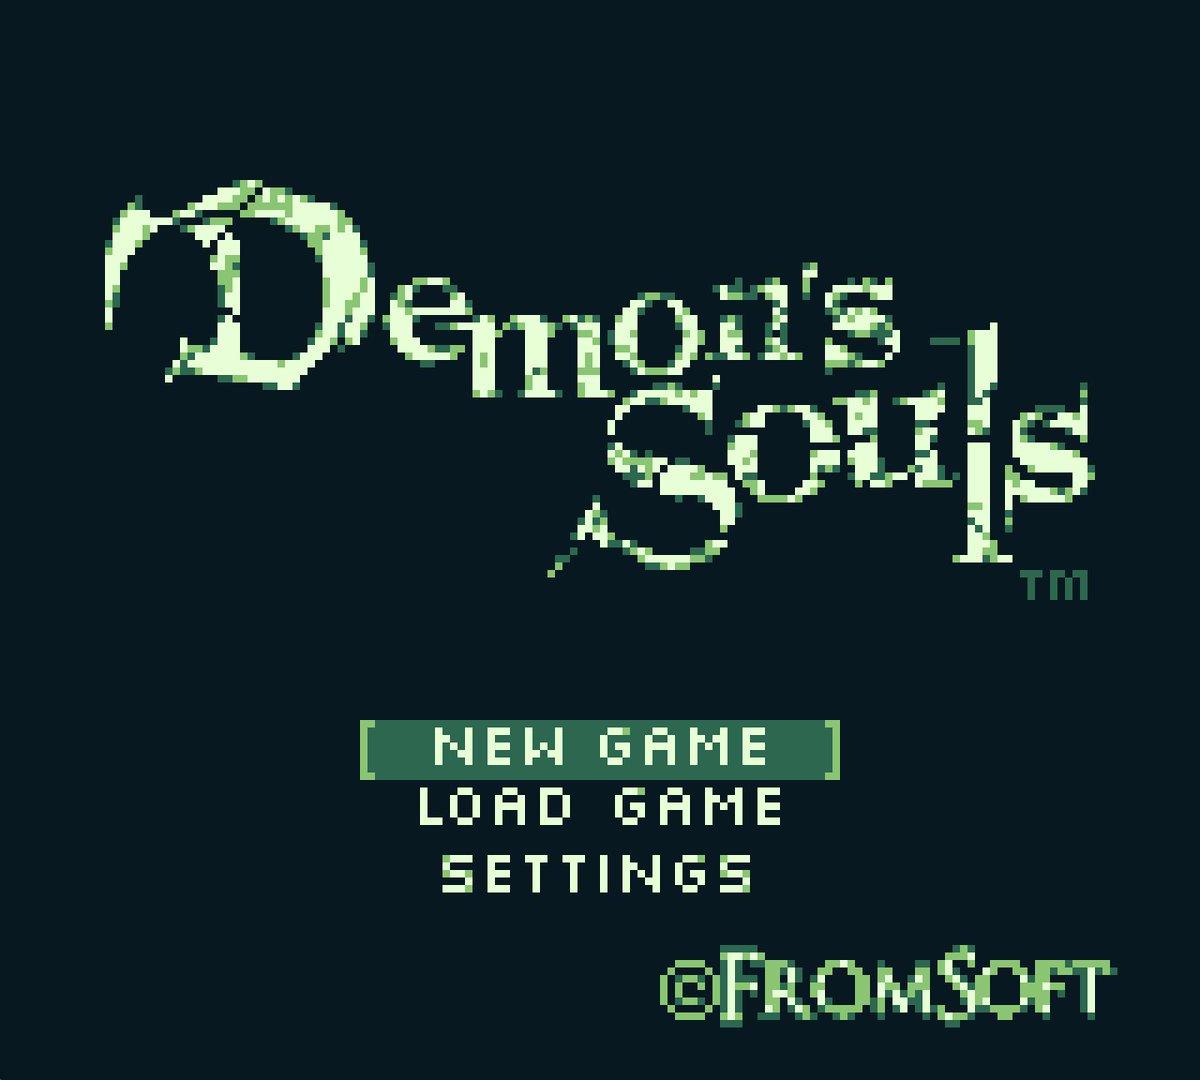 Demon's Souls on Game Boy https://t.co/hvHZ6pWF6K